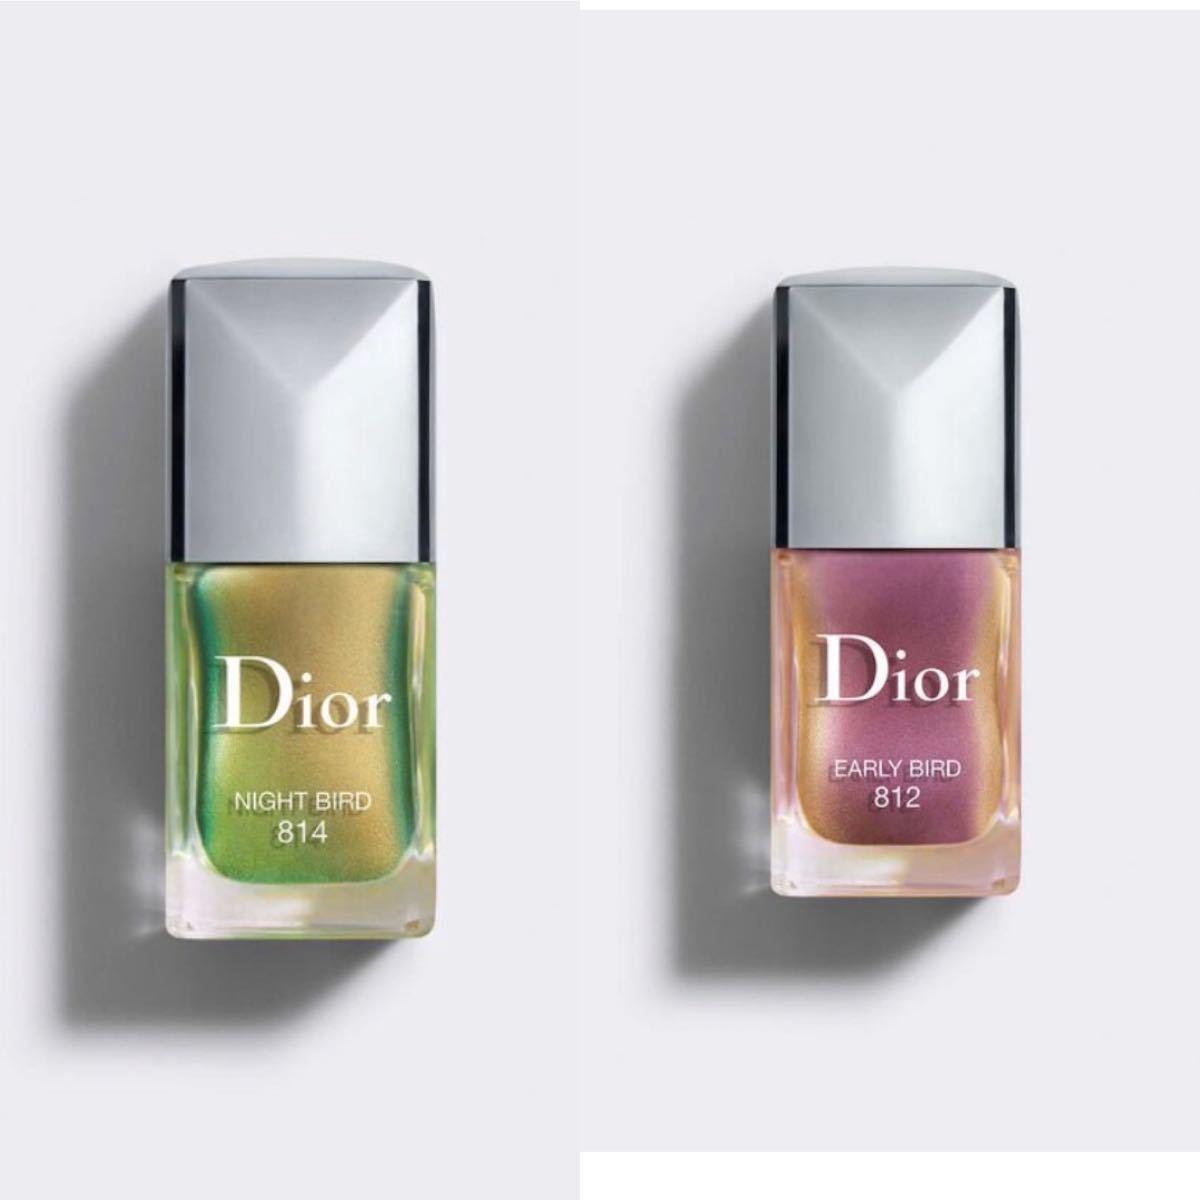 Dior ディオール ヴェルニ バーズ オブ ア フェザーフォール コレクション 2021 数量限定色 814 812